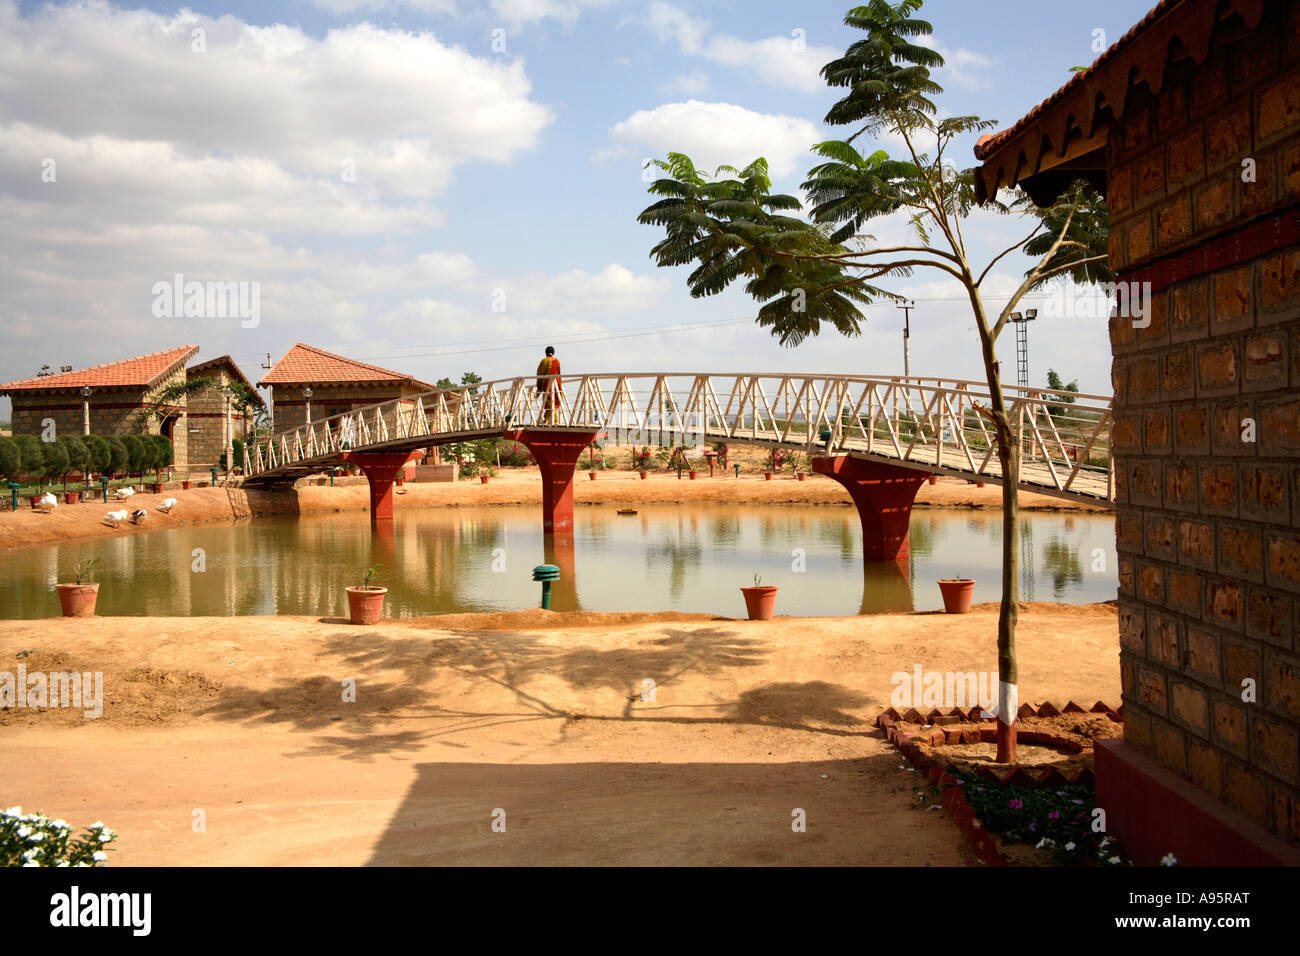 Bridge At Hiralaxmi Memorial Craft Park Bhujodi Village Kutch